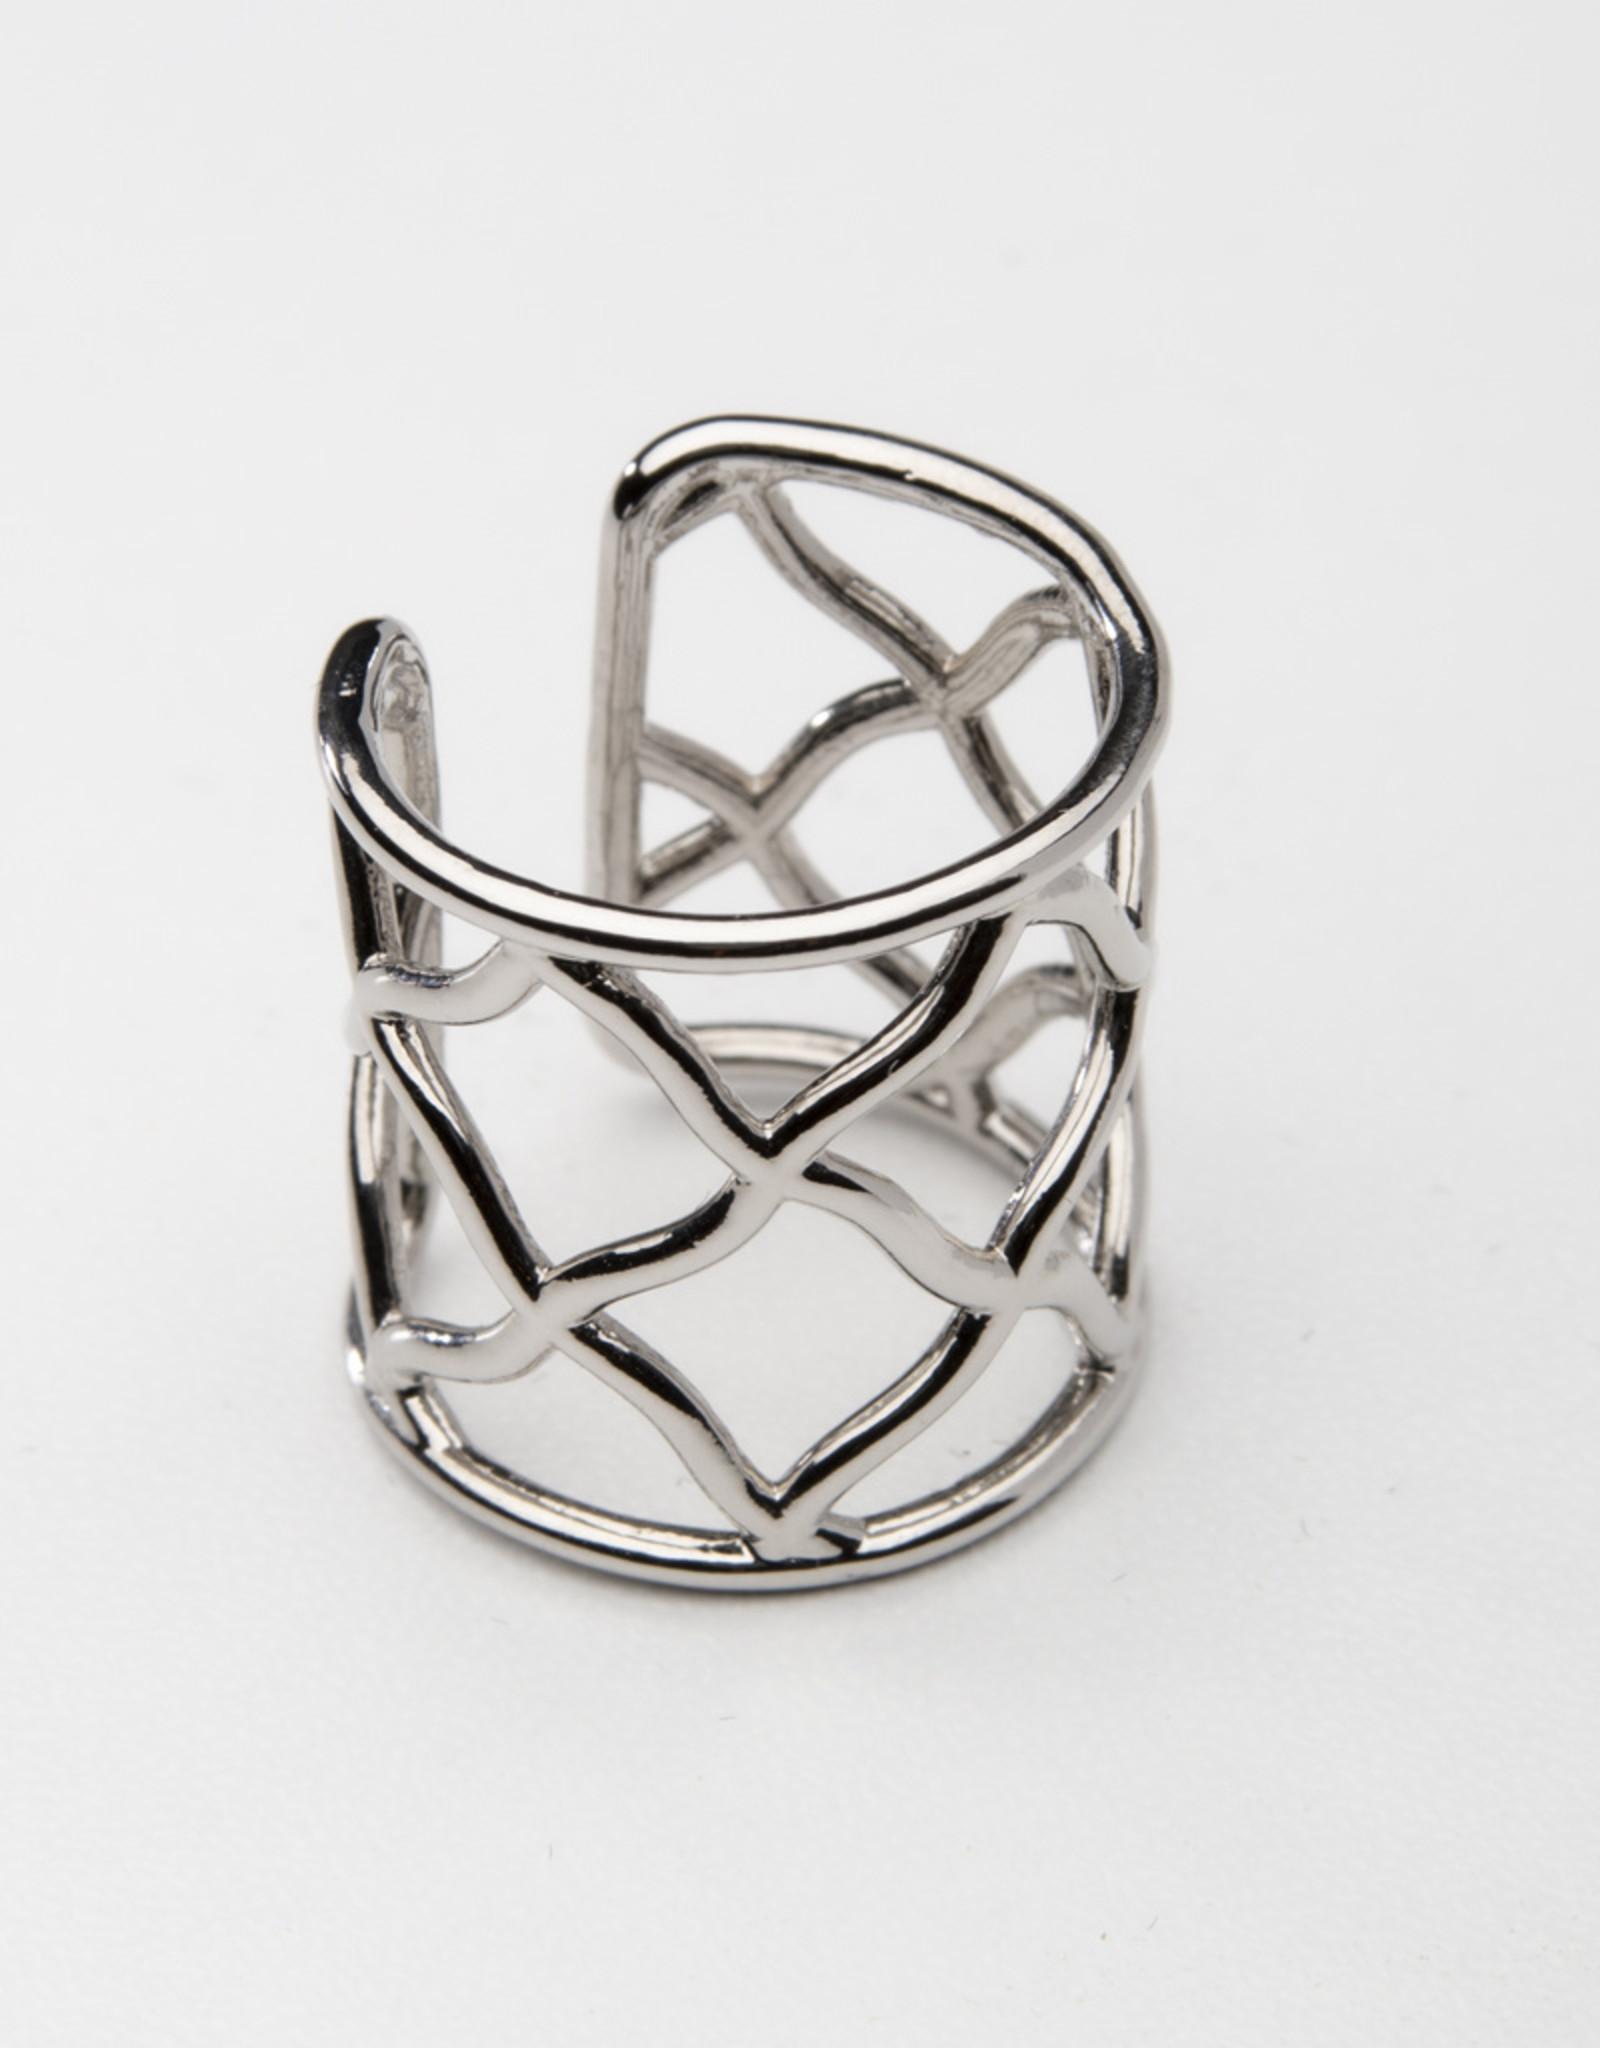 MERX Jewelry Wide Band Statement Ring